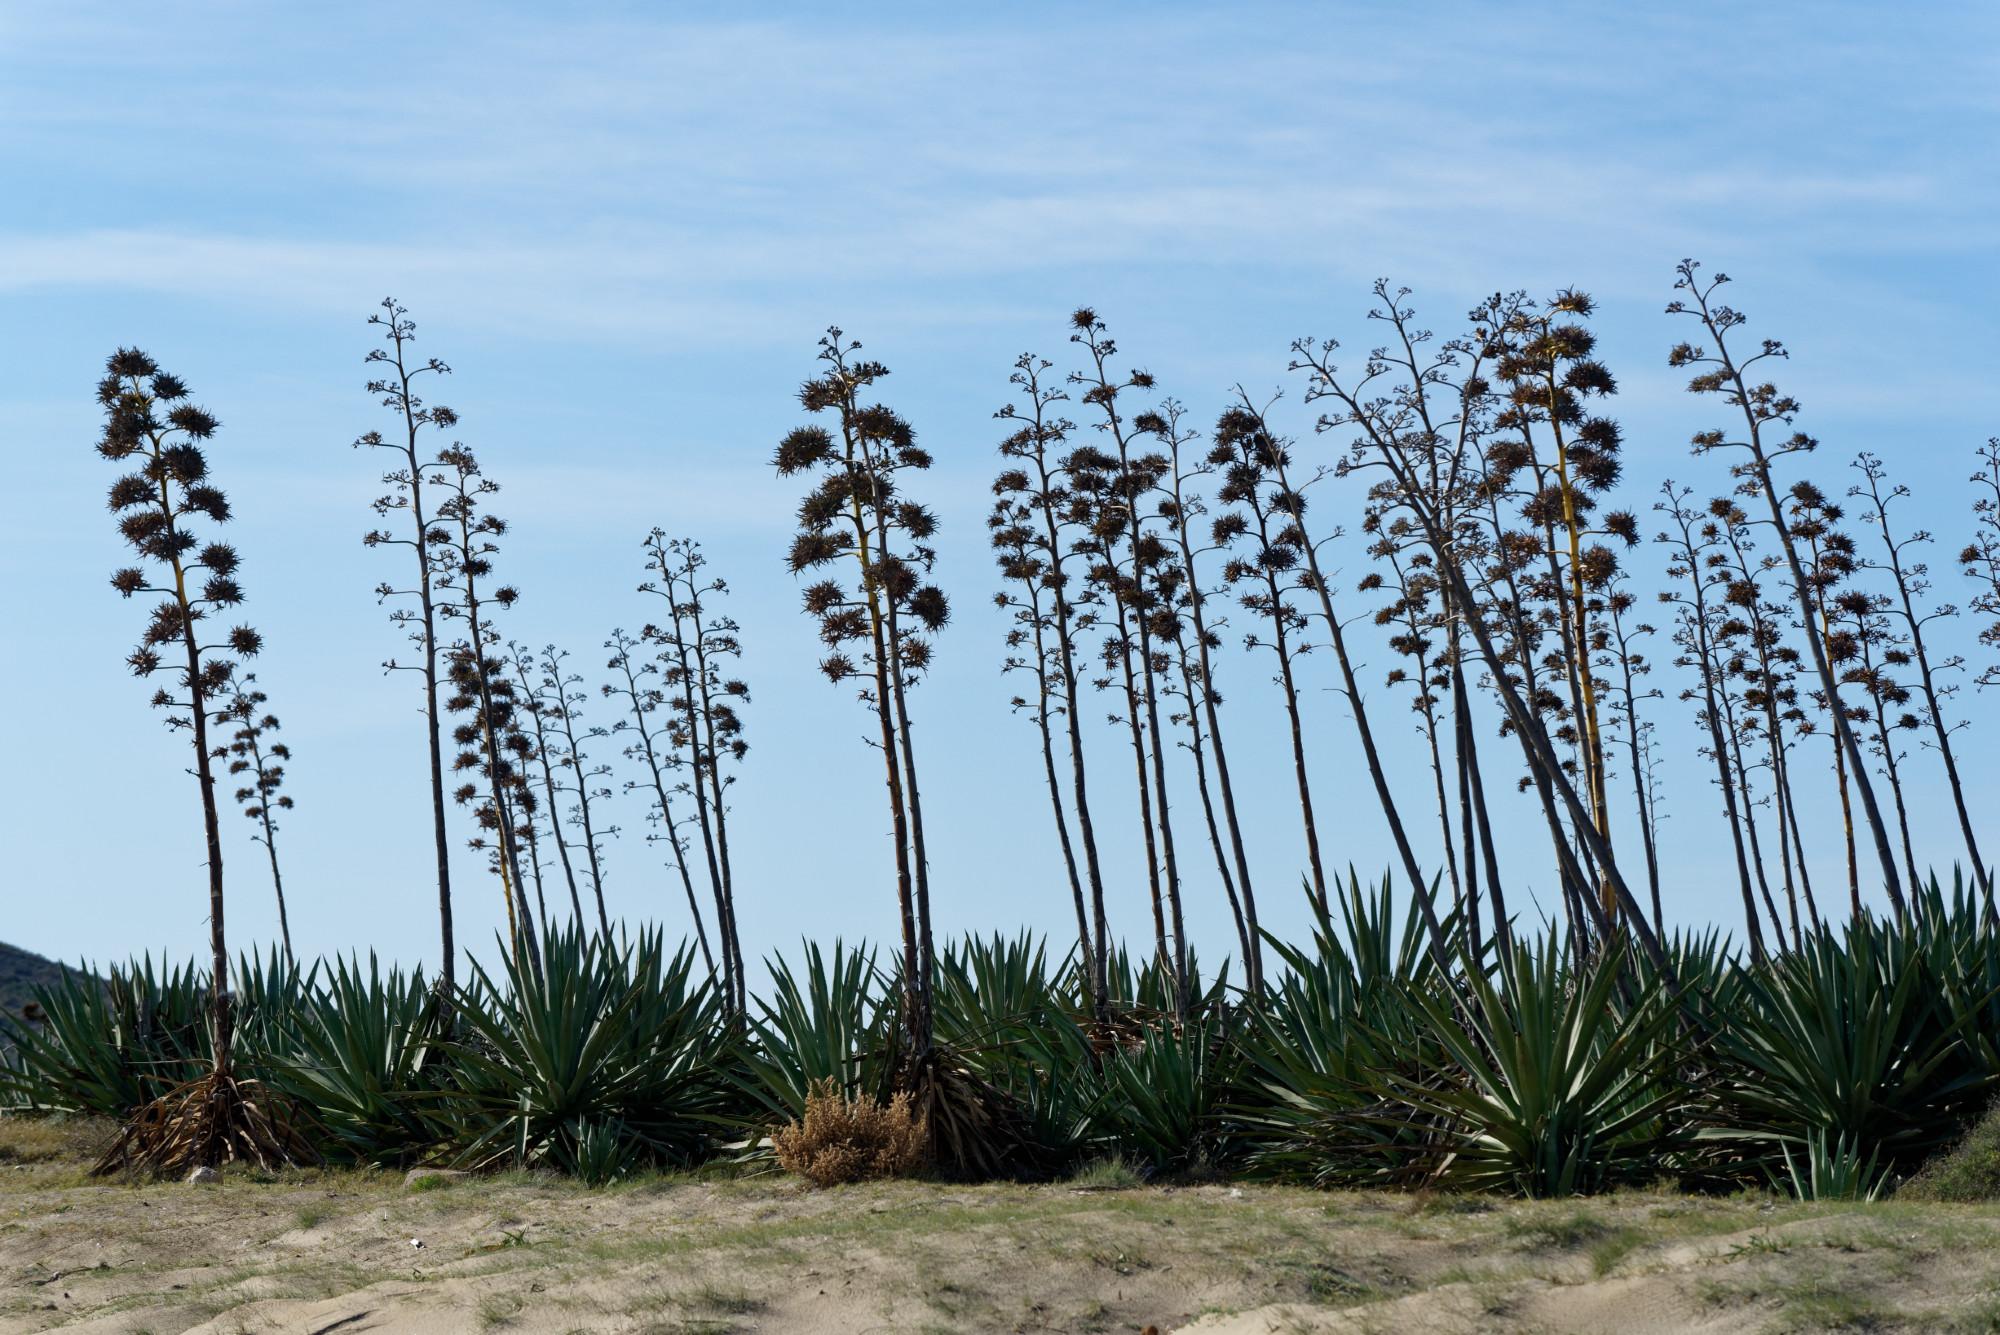 171214-San Jose-Playa de Genoveses (Cabo de Gata-Andalousie) (132)